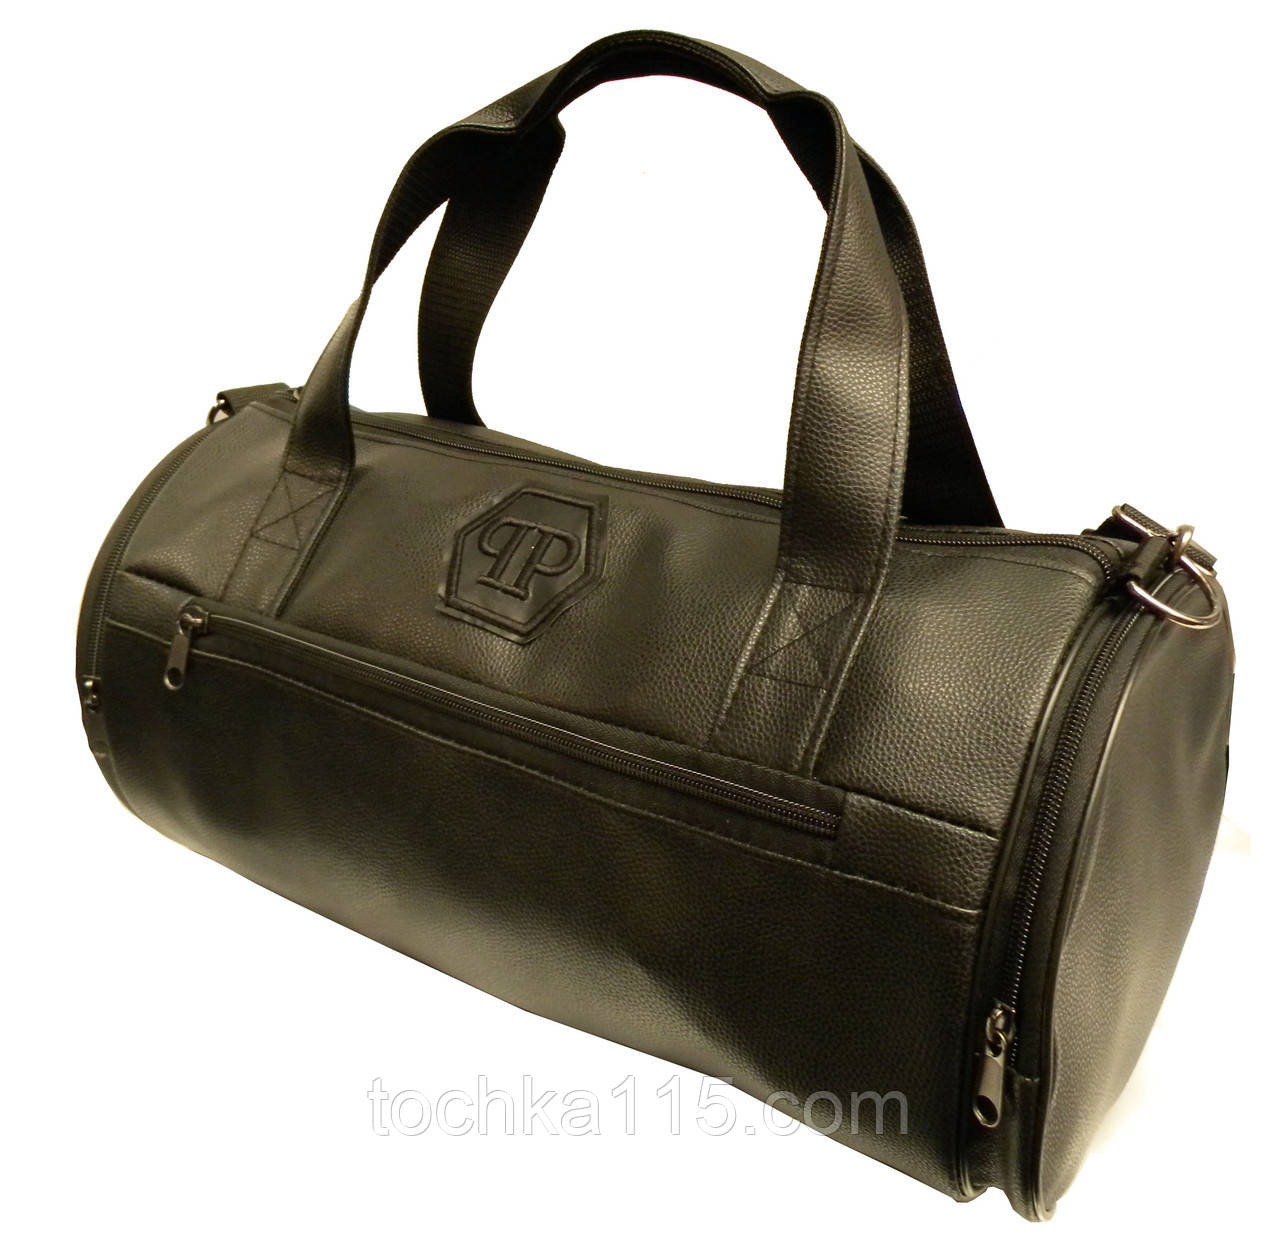 Кожаная сумка бочка Philipp Plein 5fc3107acdfaf